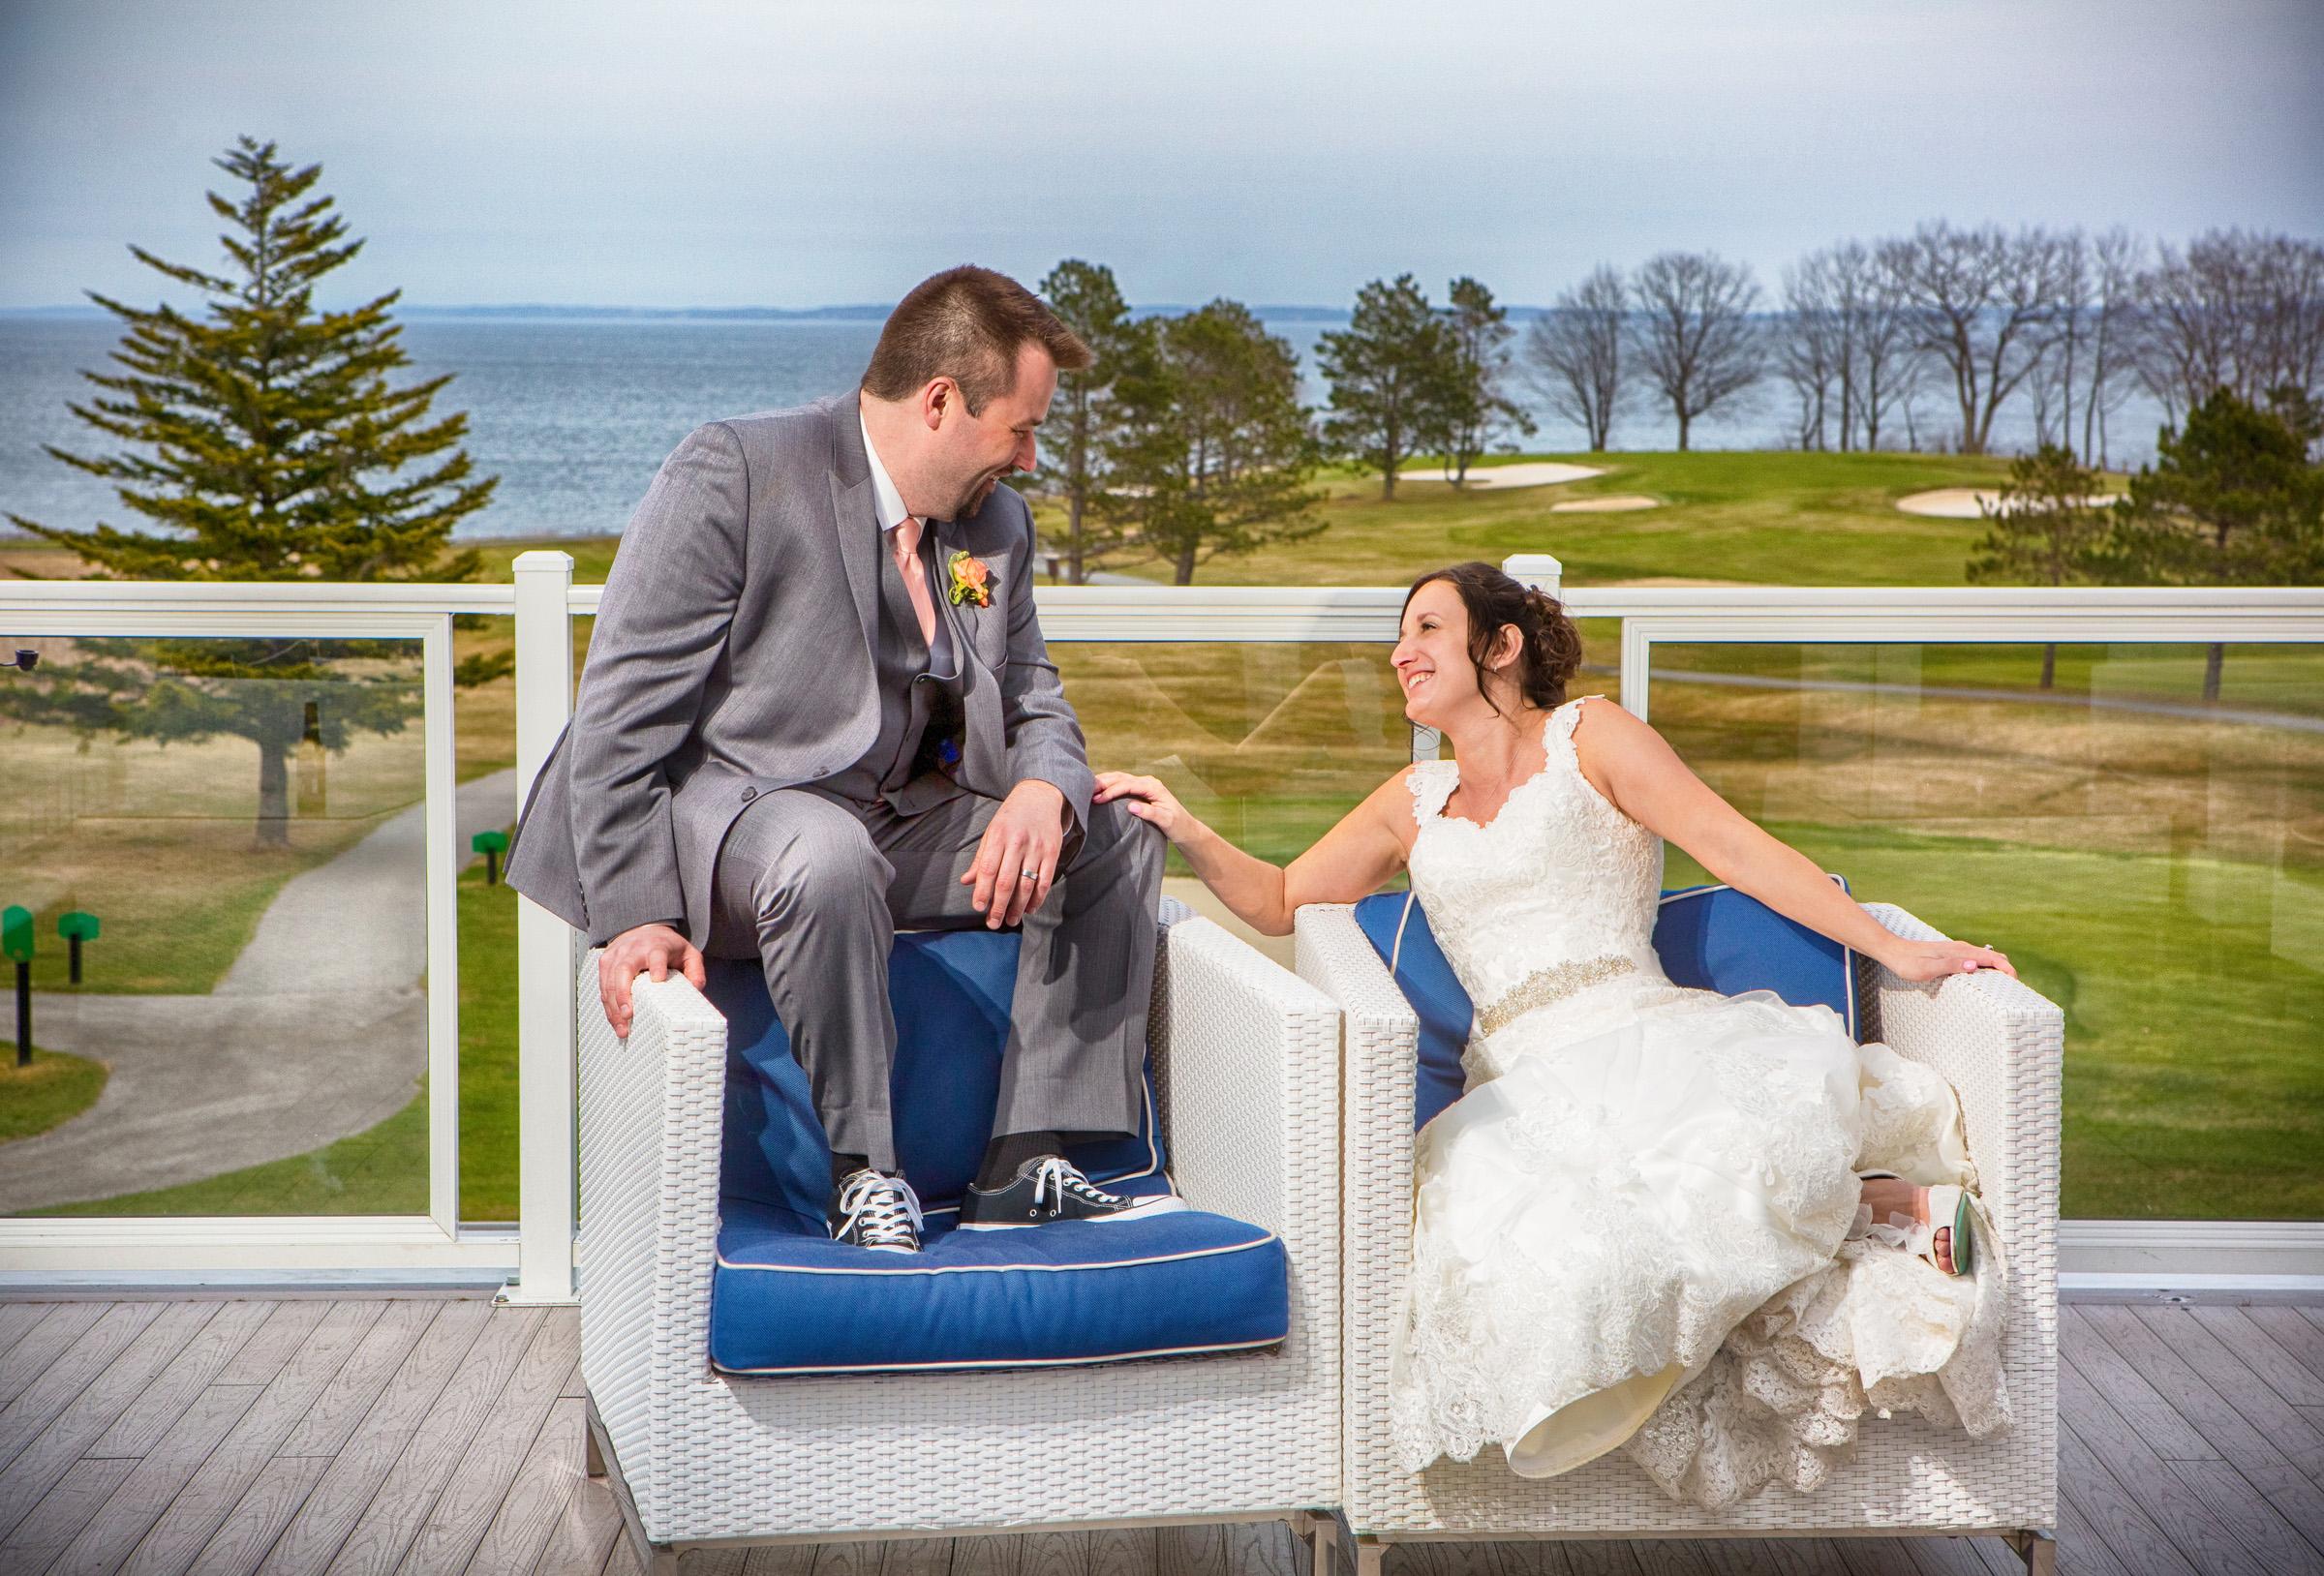 wedding photo of couple at samoset resort